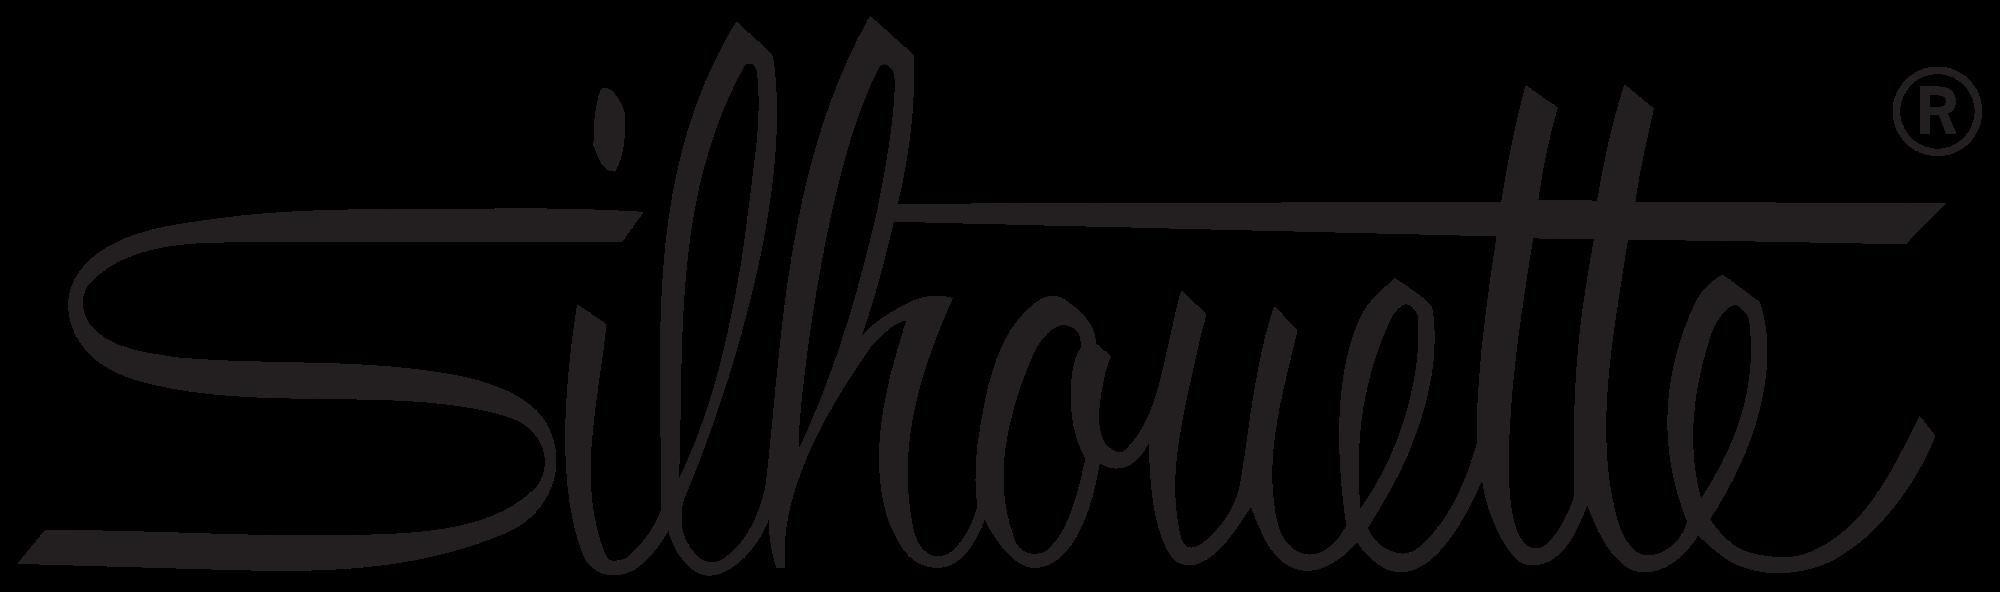 2000x592 Filesilhouette (Unternehmen) Logo.svg